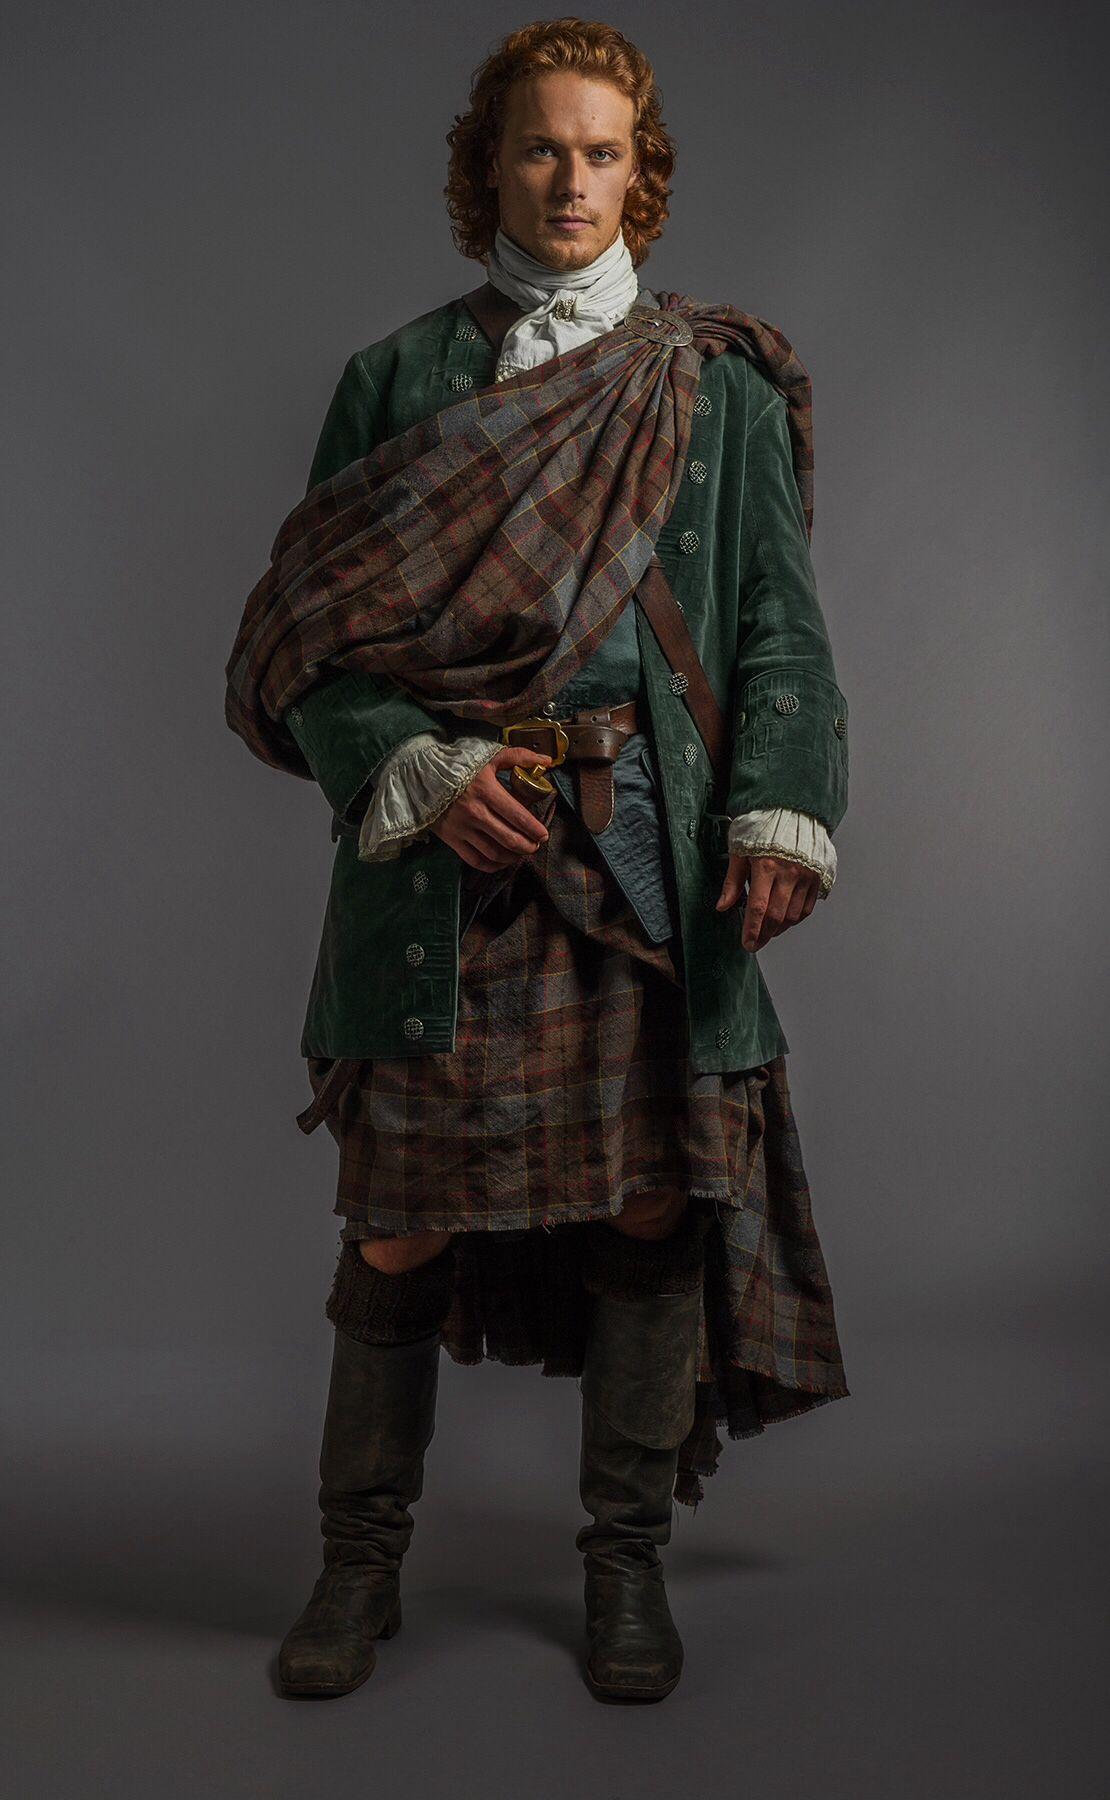 Jamie wedding attire Outlander wedding, Outlander